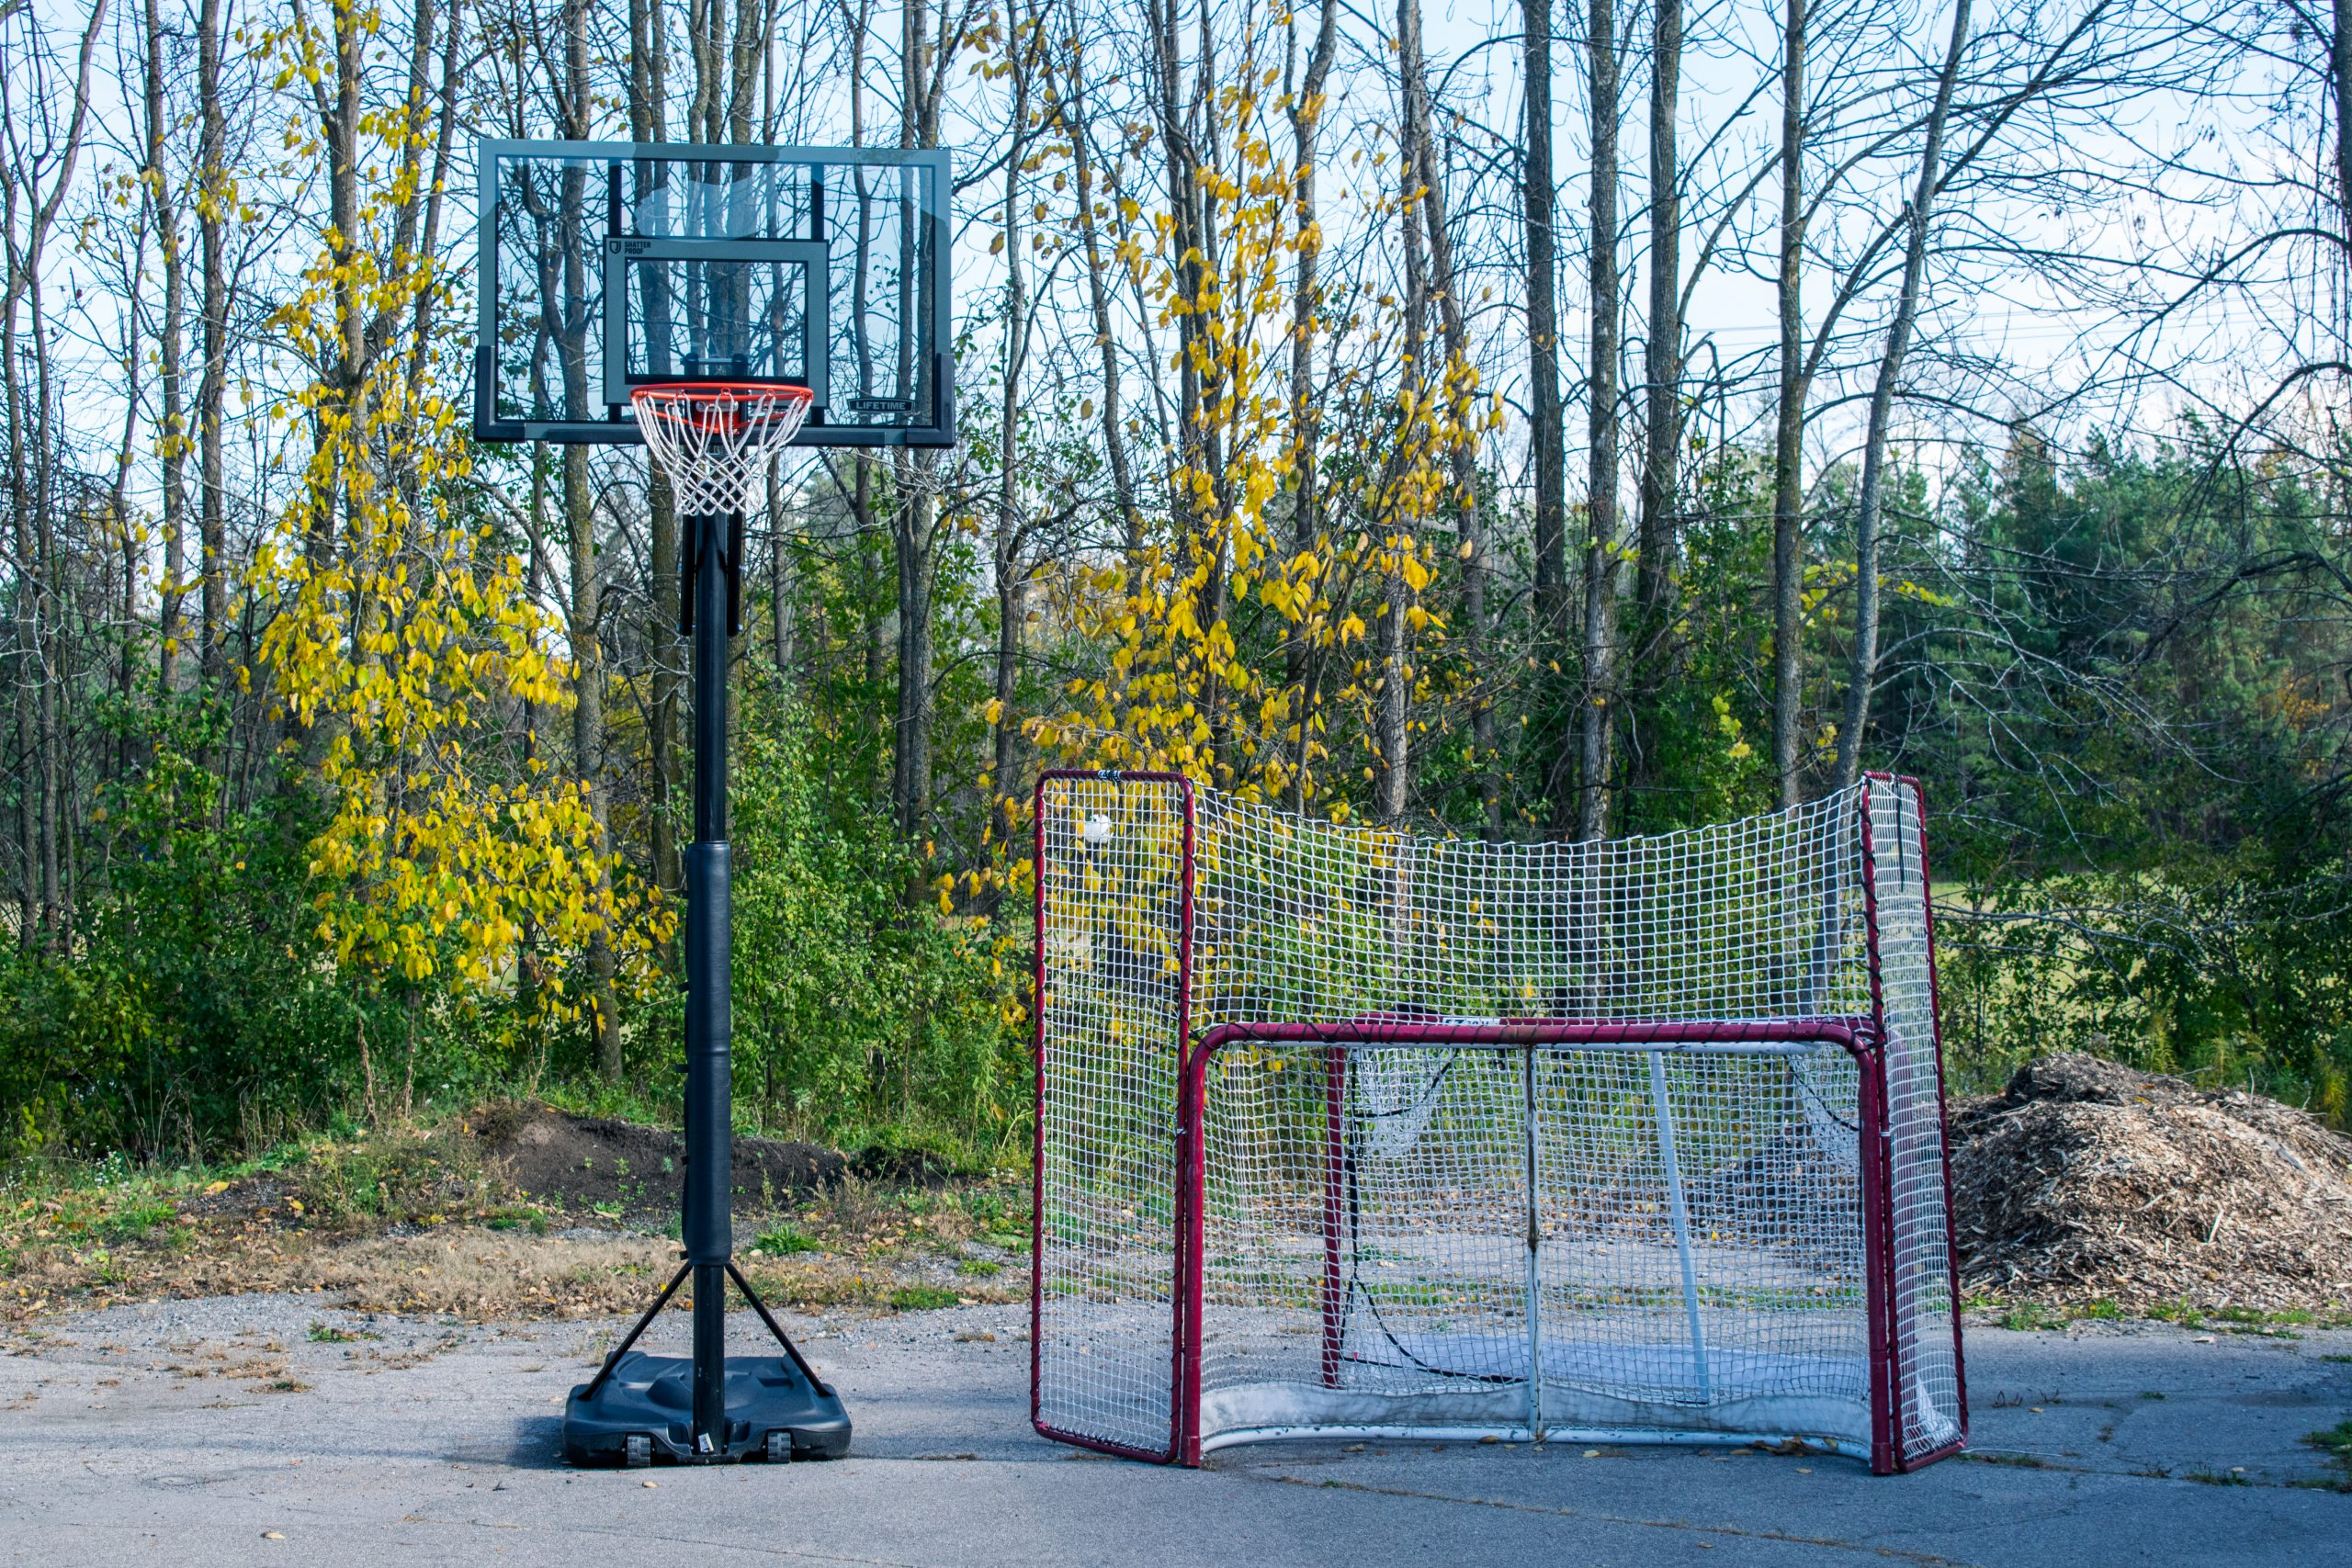 Basketball & Roller Hockey